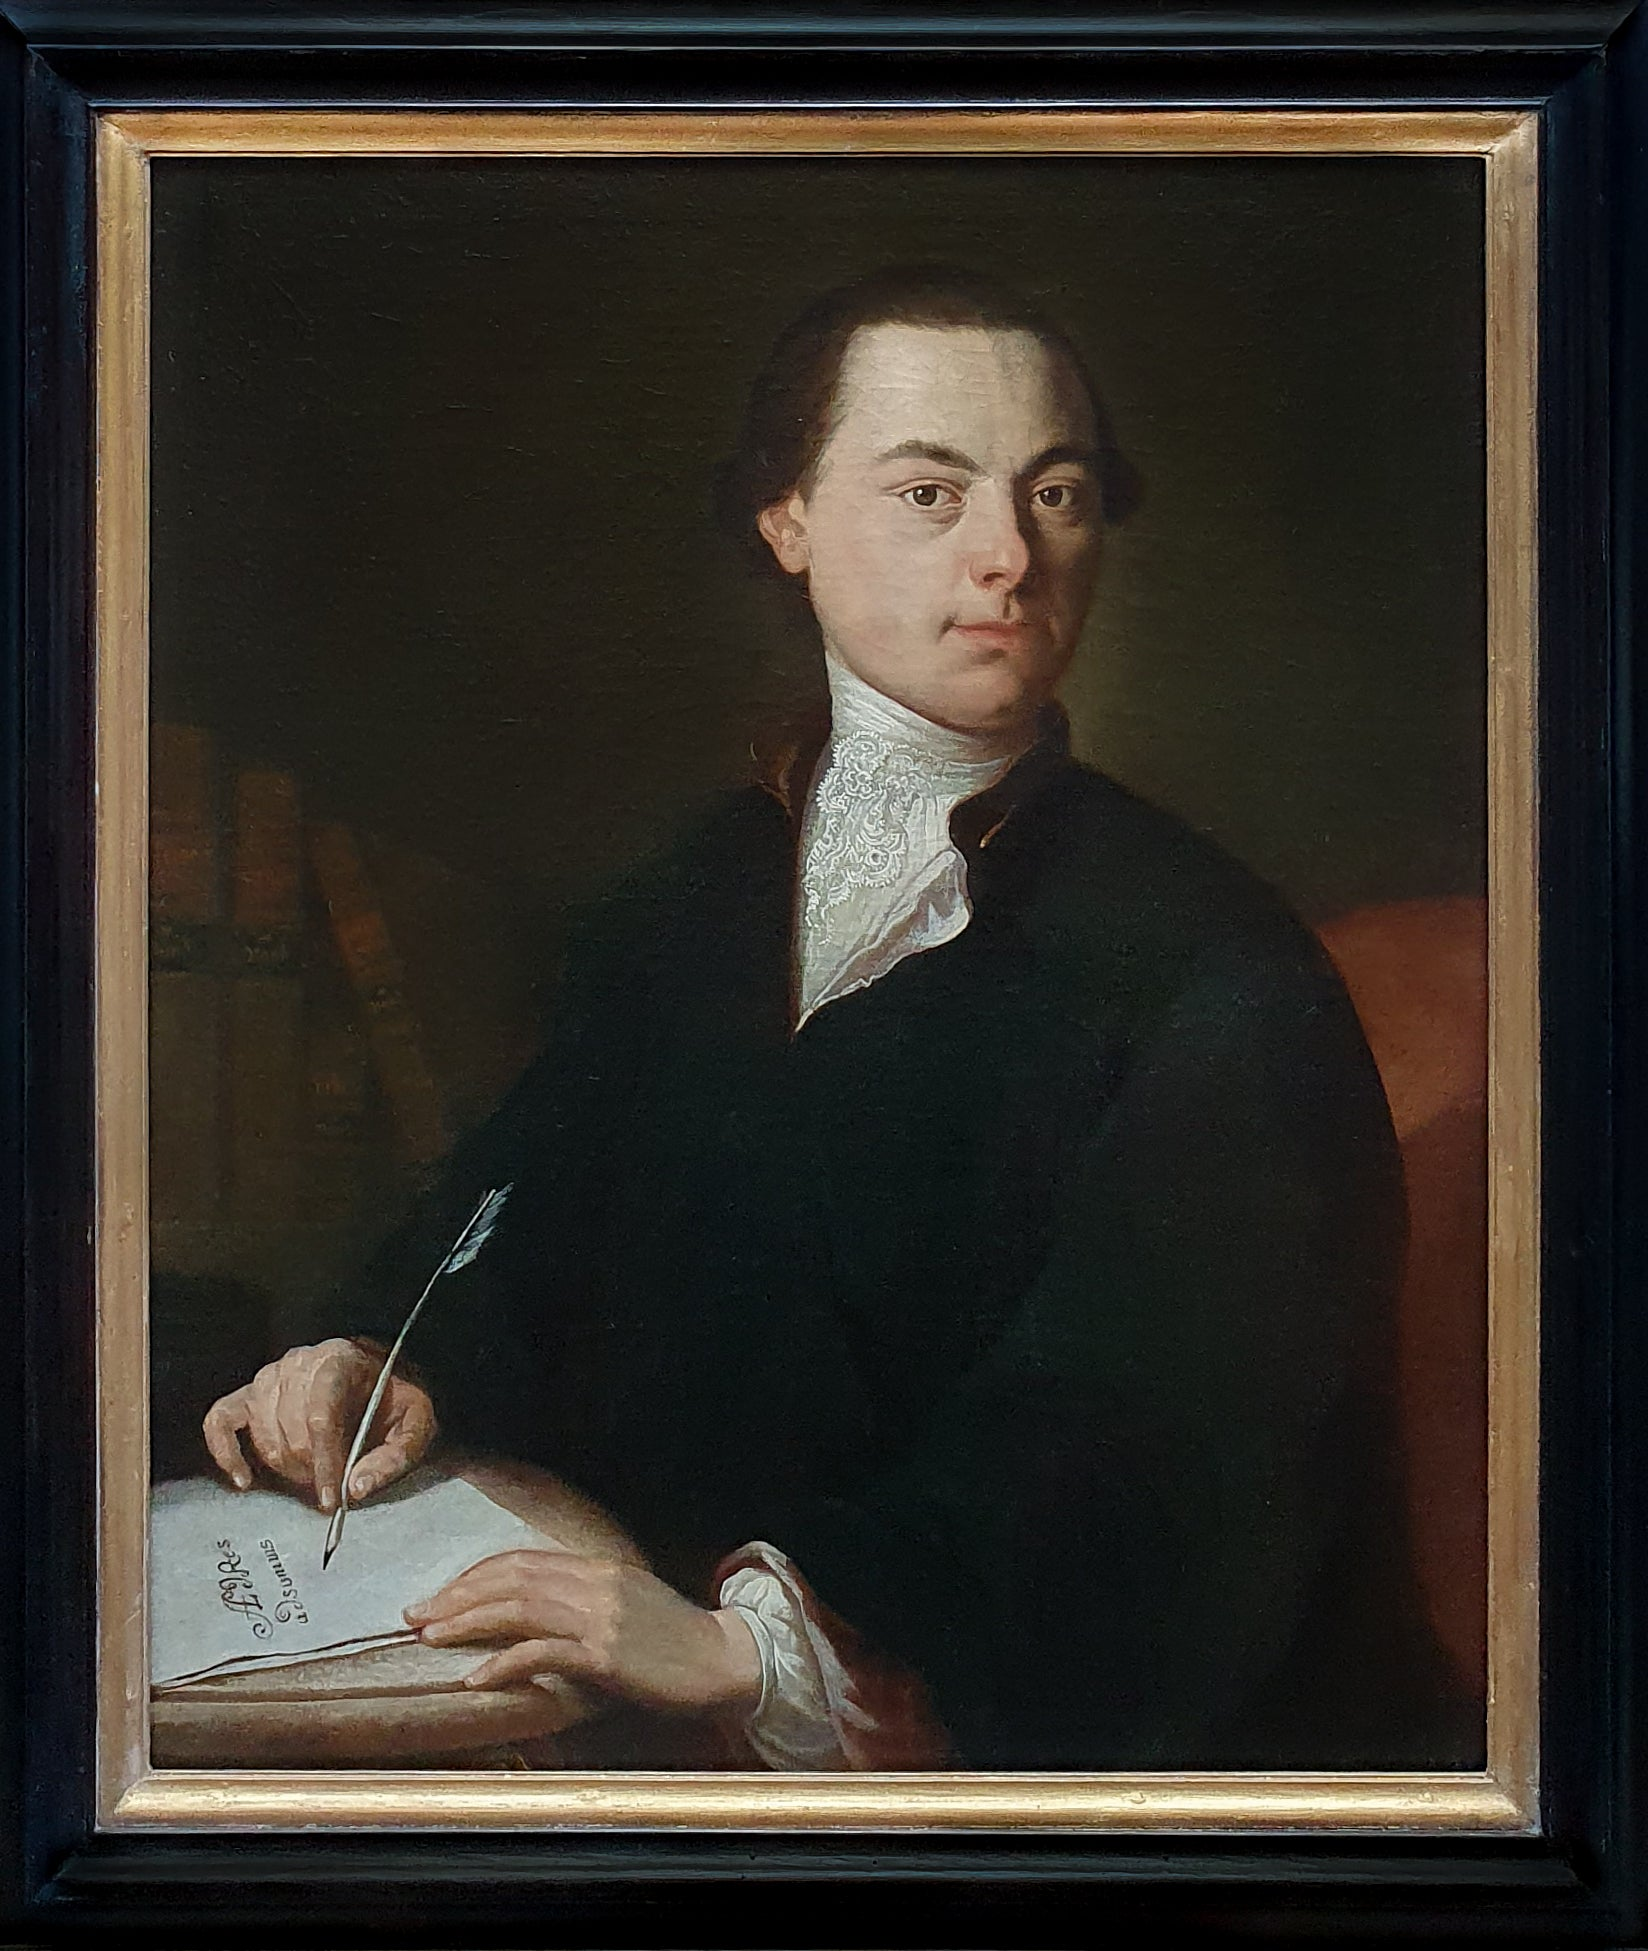 Portrait of a Gentleman Poet c.1760, Antique Oil Painting, Homer Virgil Gellert